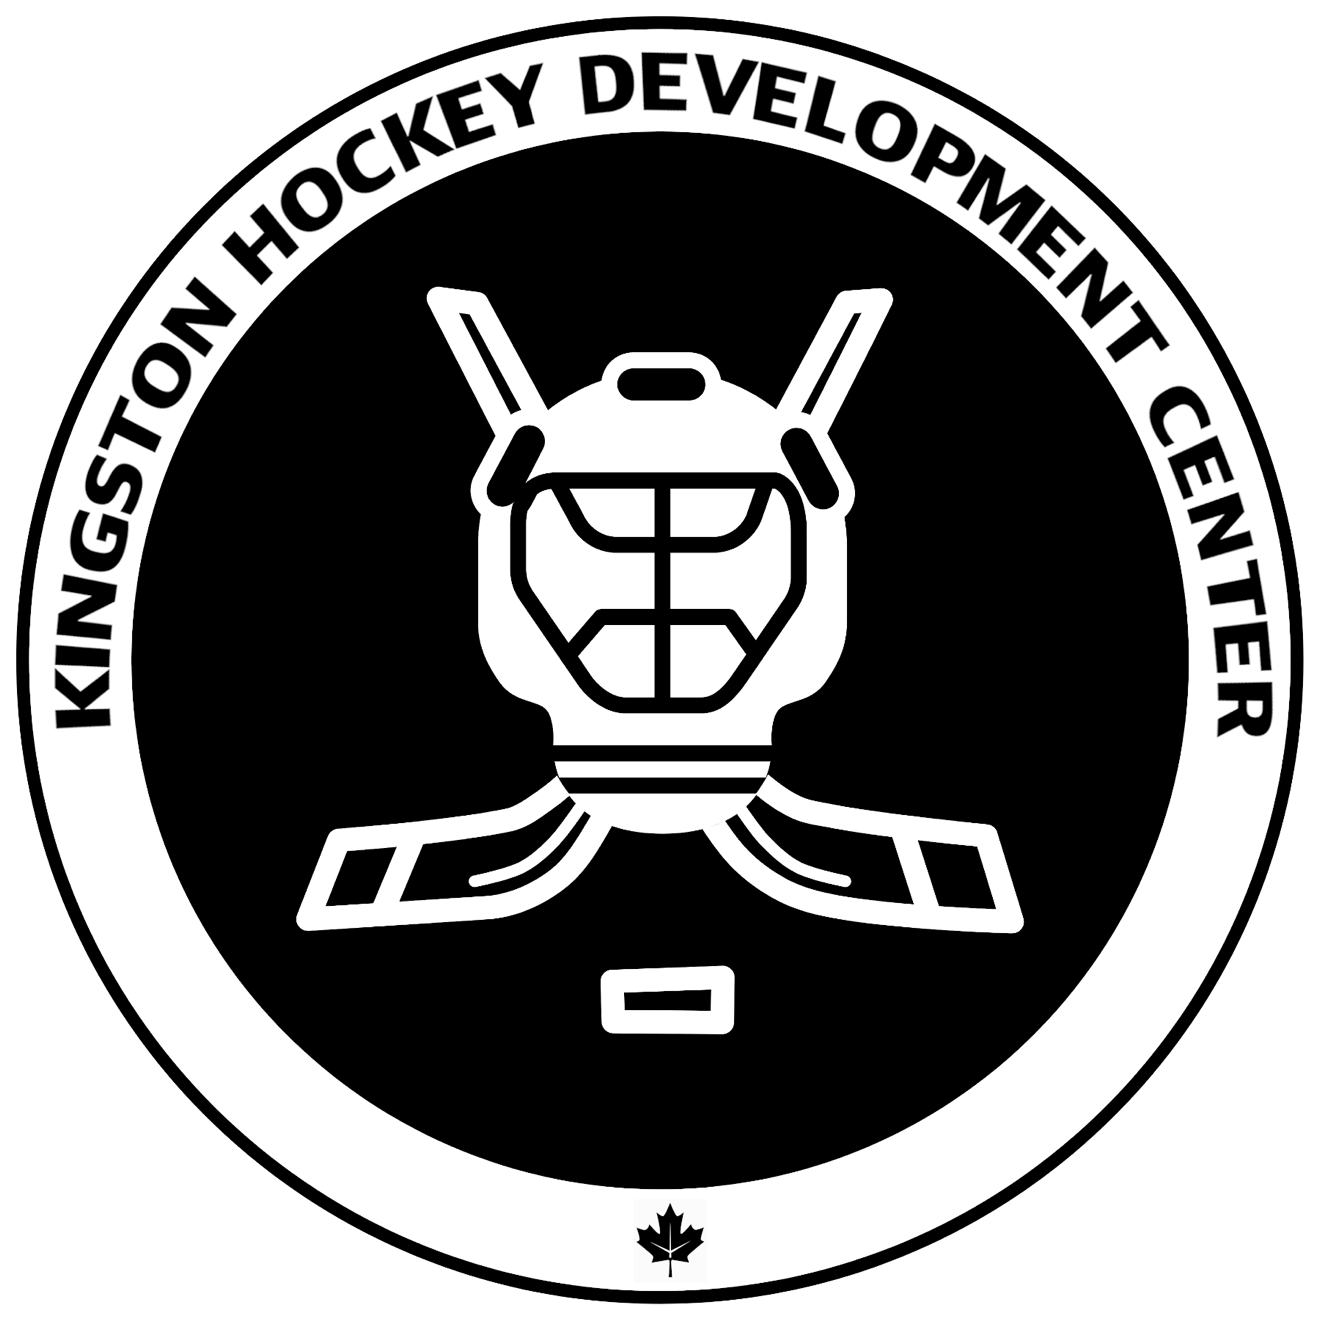 logo of KHDC